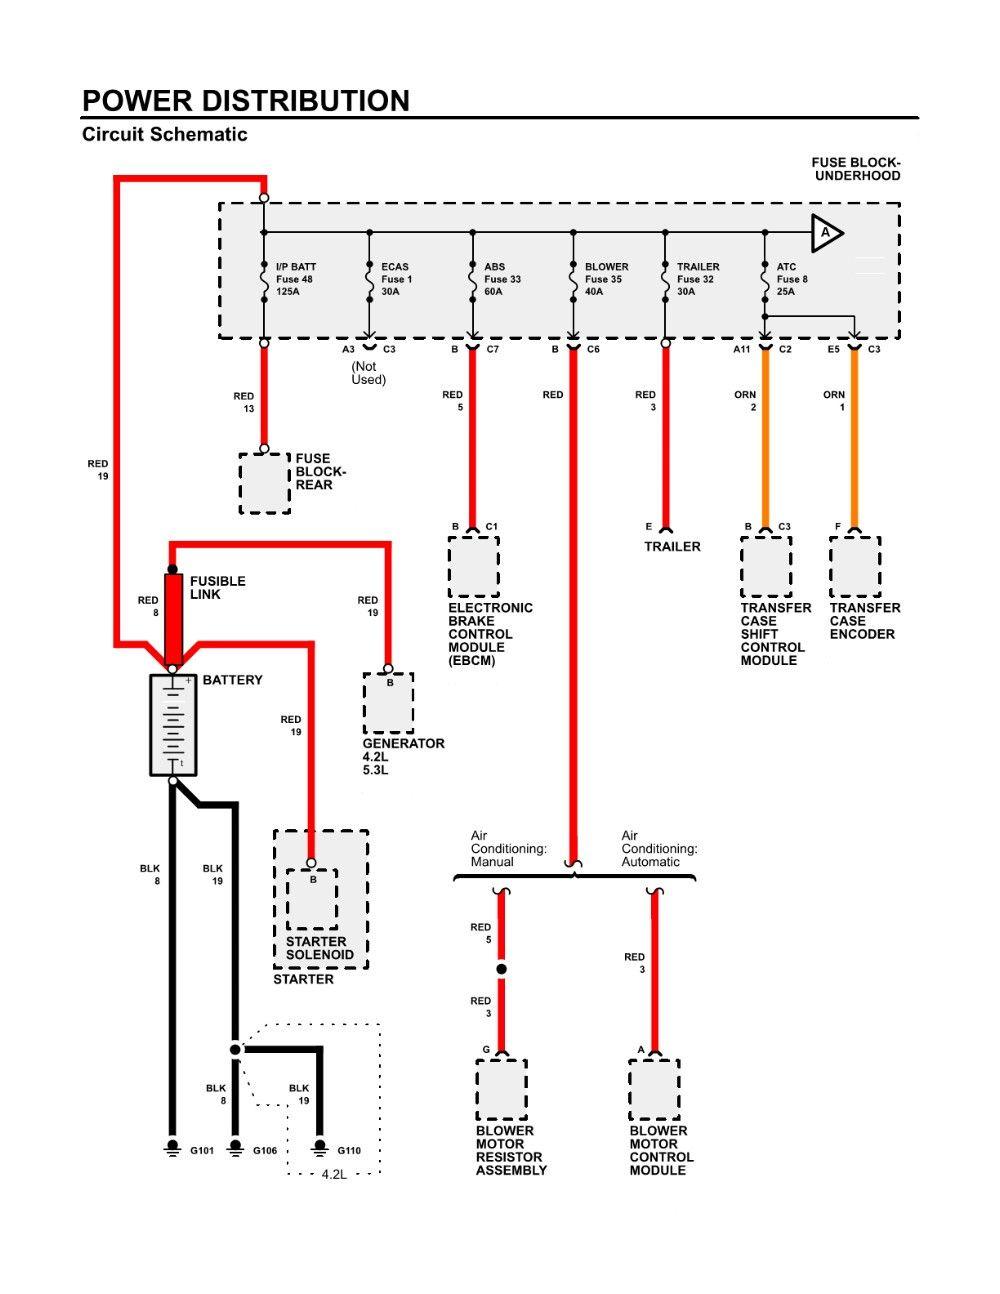 gm blower motor wiring - data wiring diagram thick-greet -  thick-greet.vivarelliauto.it  vivarelliauto.it